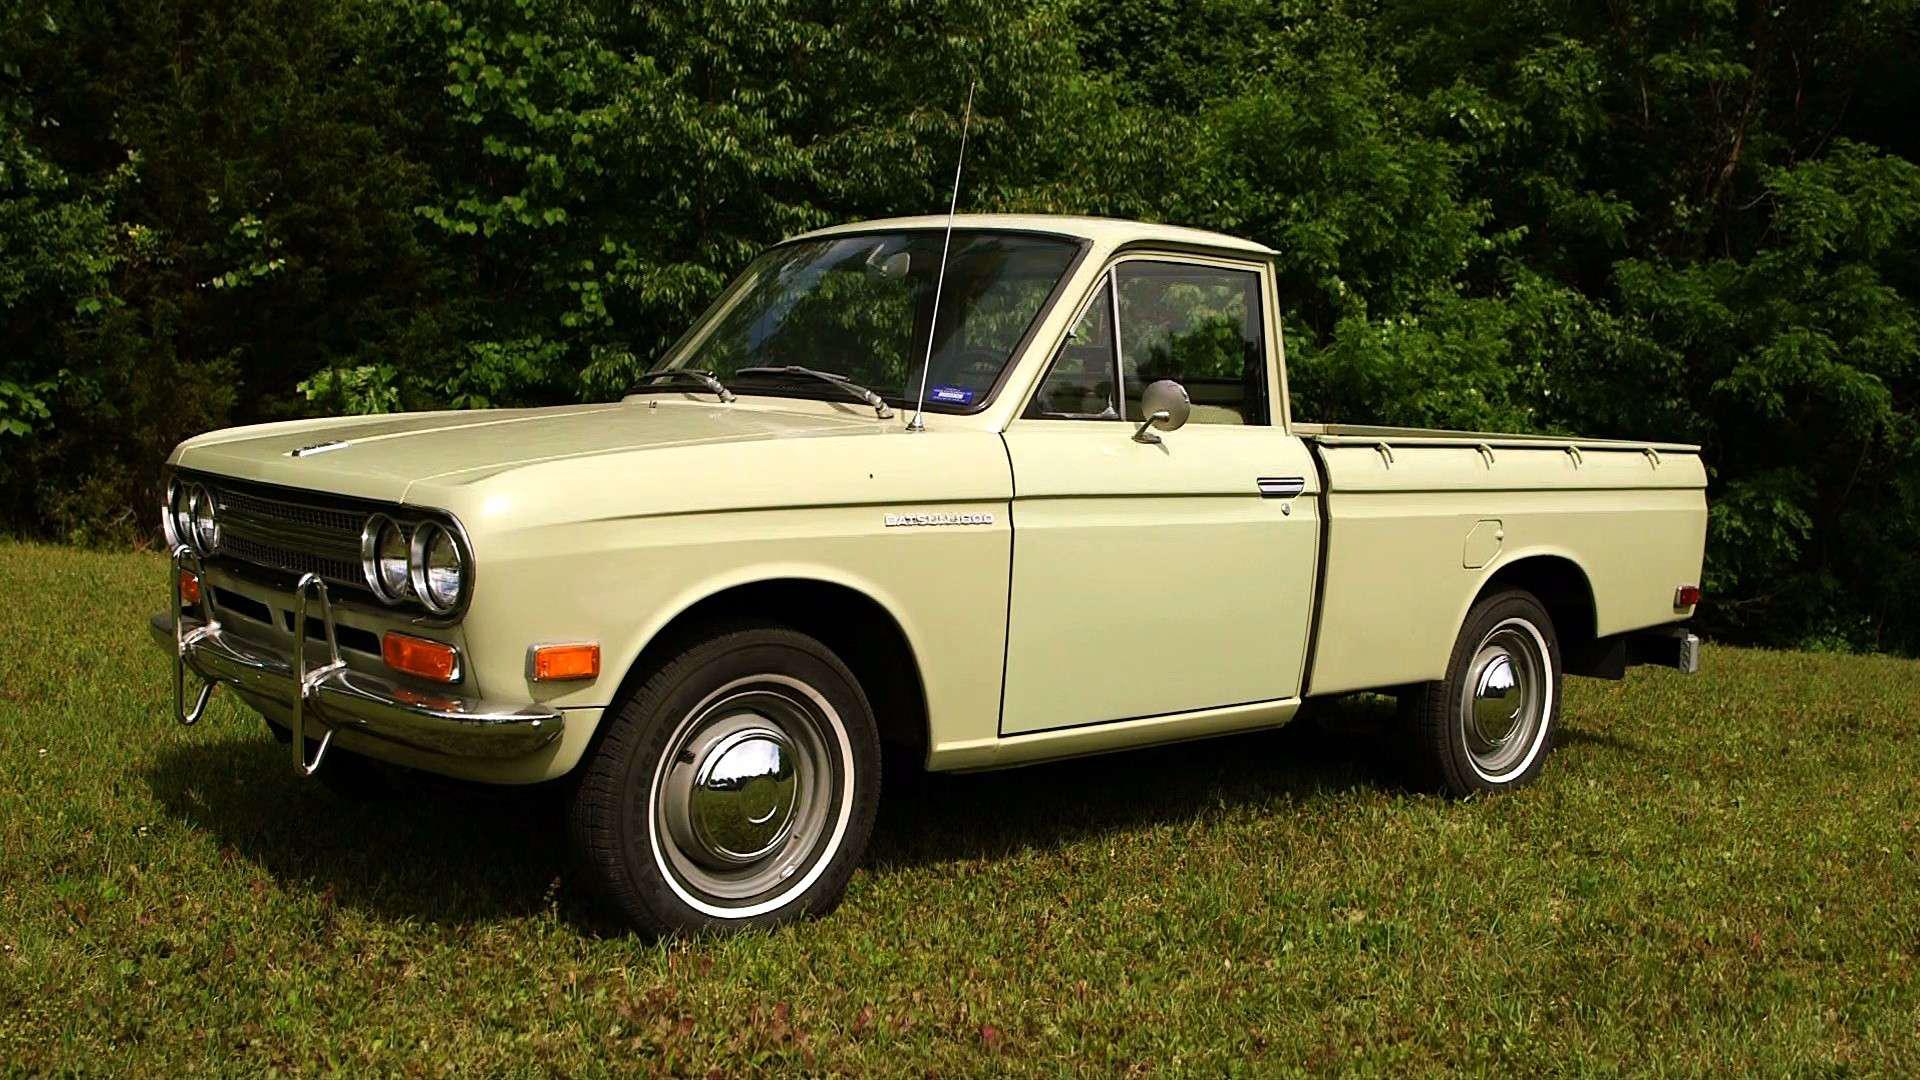 Nissan Dealership Nashville >> Tennessee man reunited with iconic Datsun pickup | Medium ...